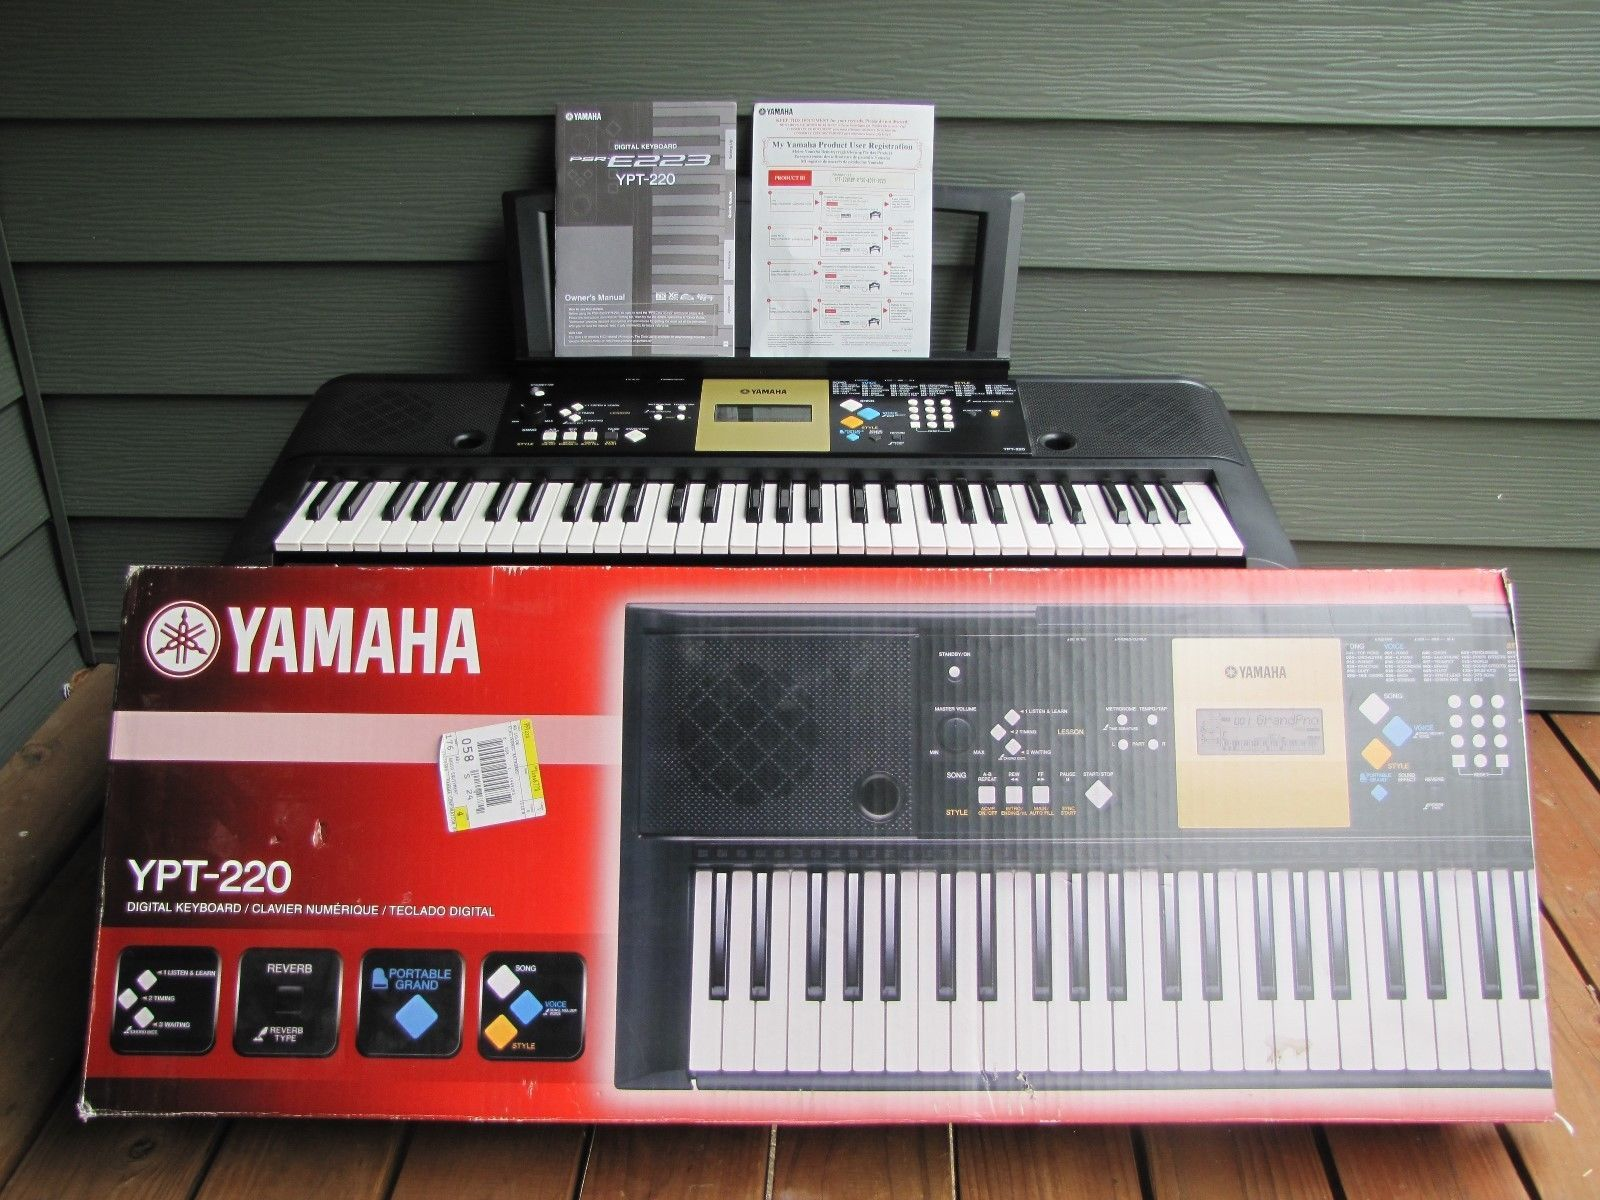 yamaha electronic keyboard model ypt 220 iob and 50 similar items rh bonanza com Manual Guide Service Manuals